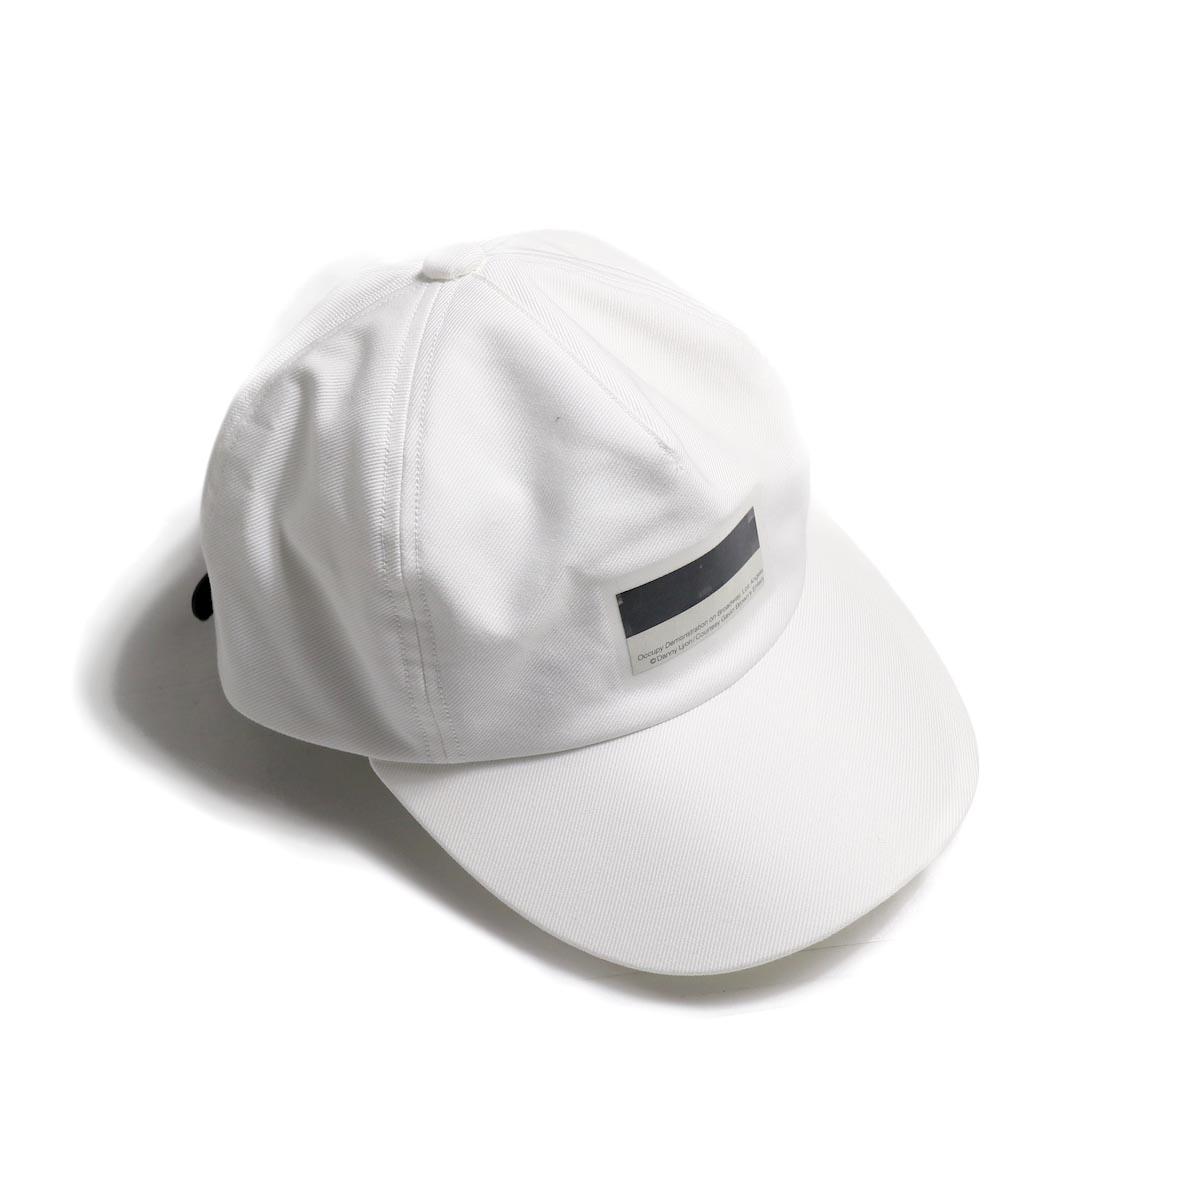 COMESANDGOES / Coating Assort Cap (NO.14508) WHITE